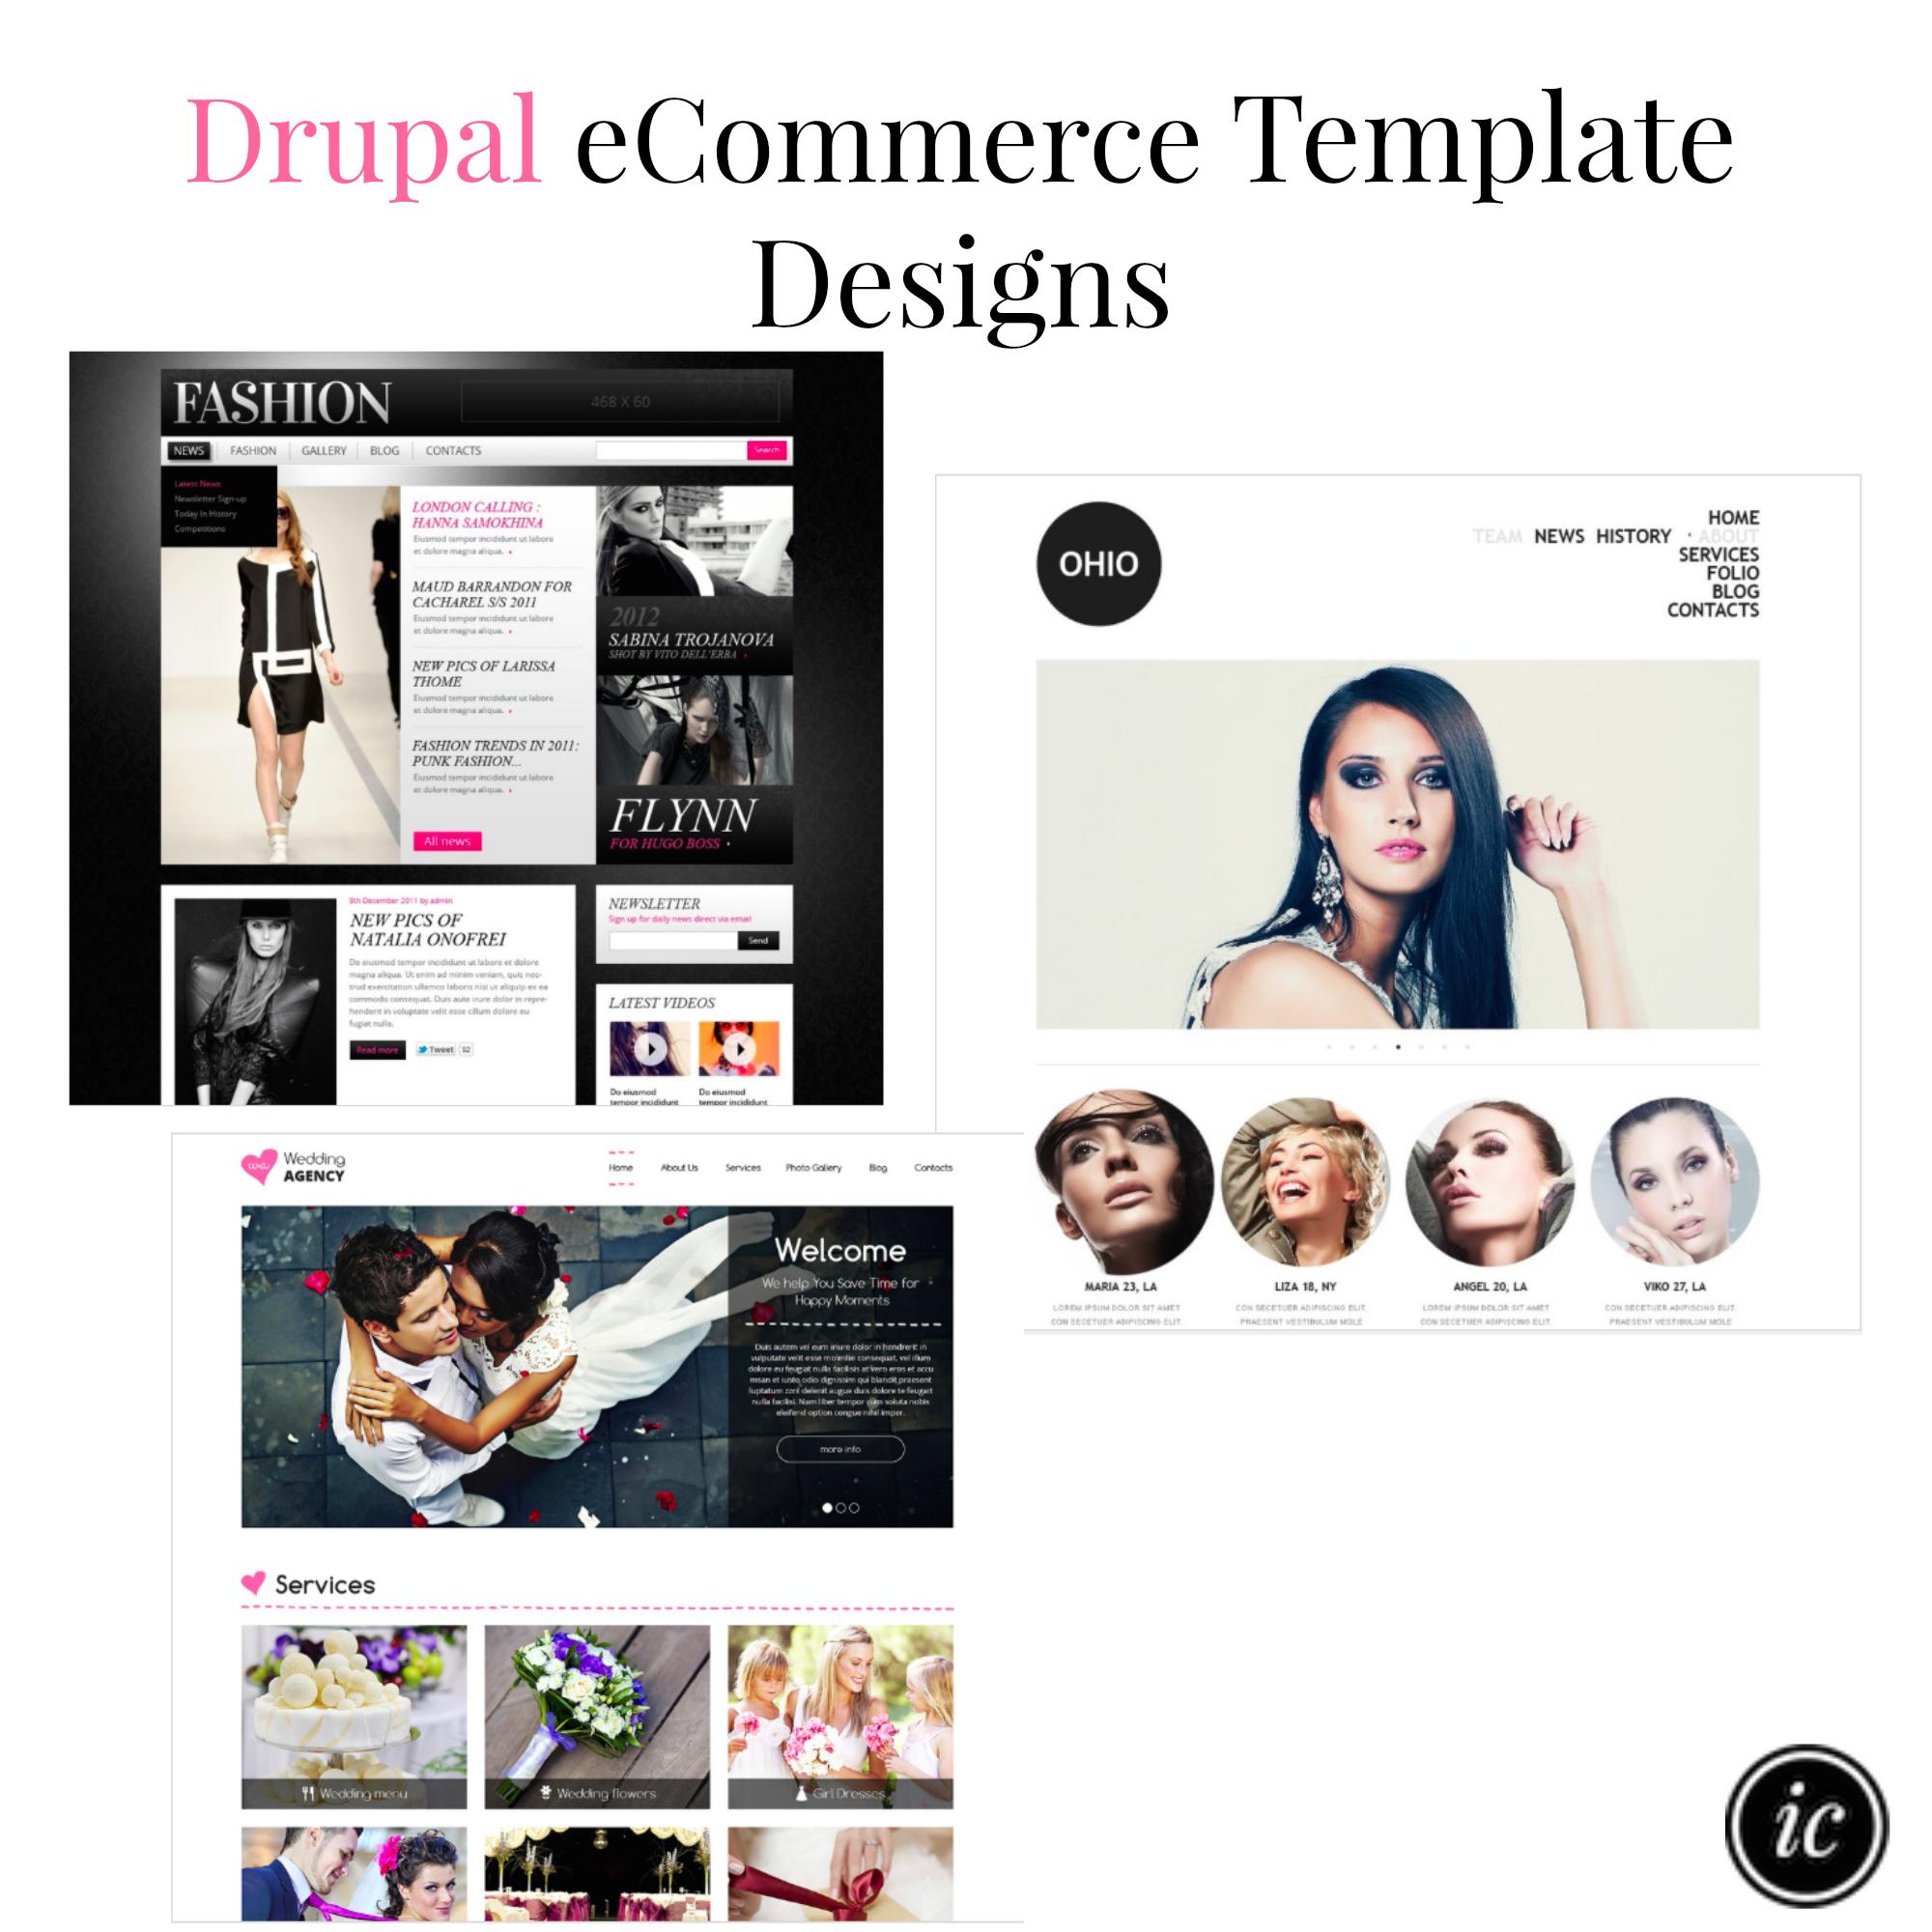 Drupal eCommerce Template Designs